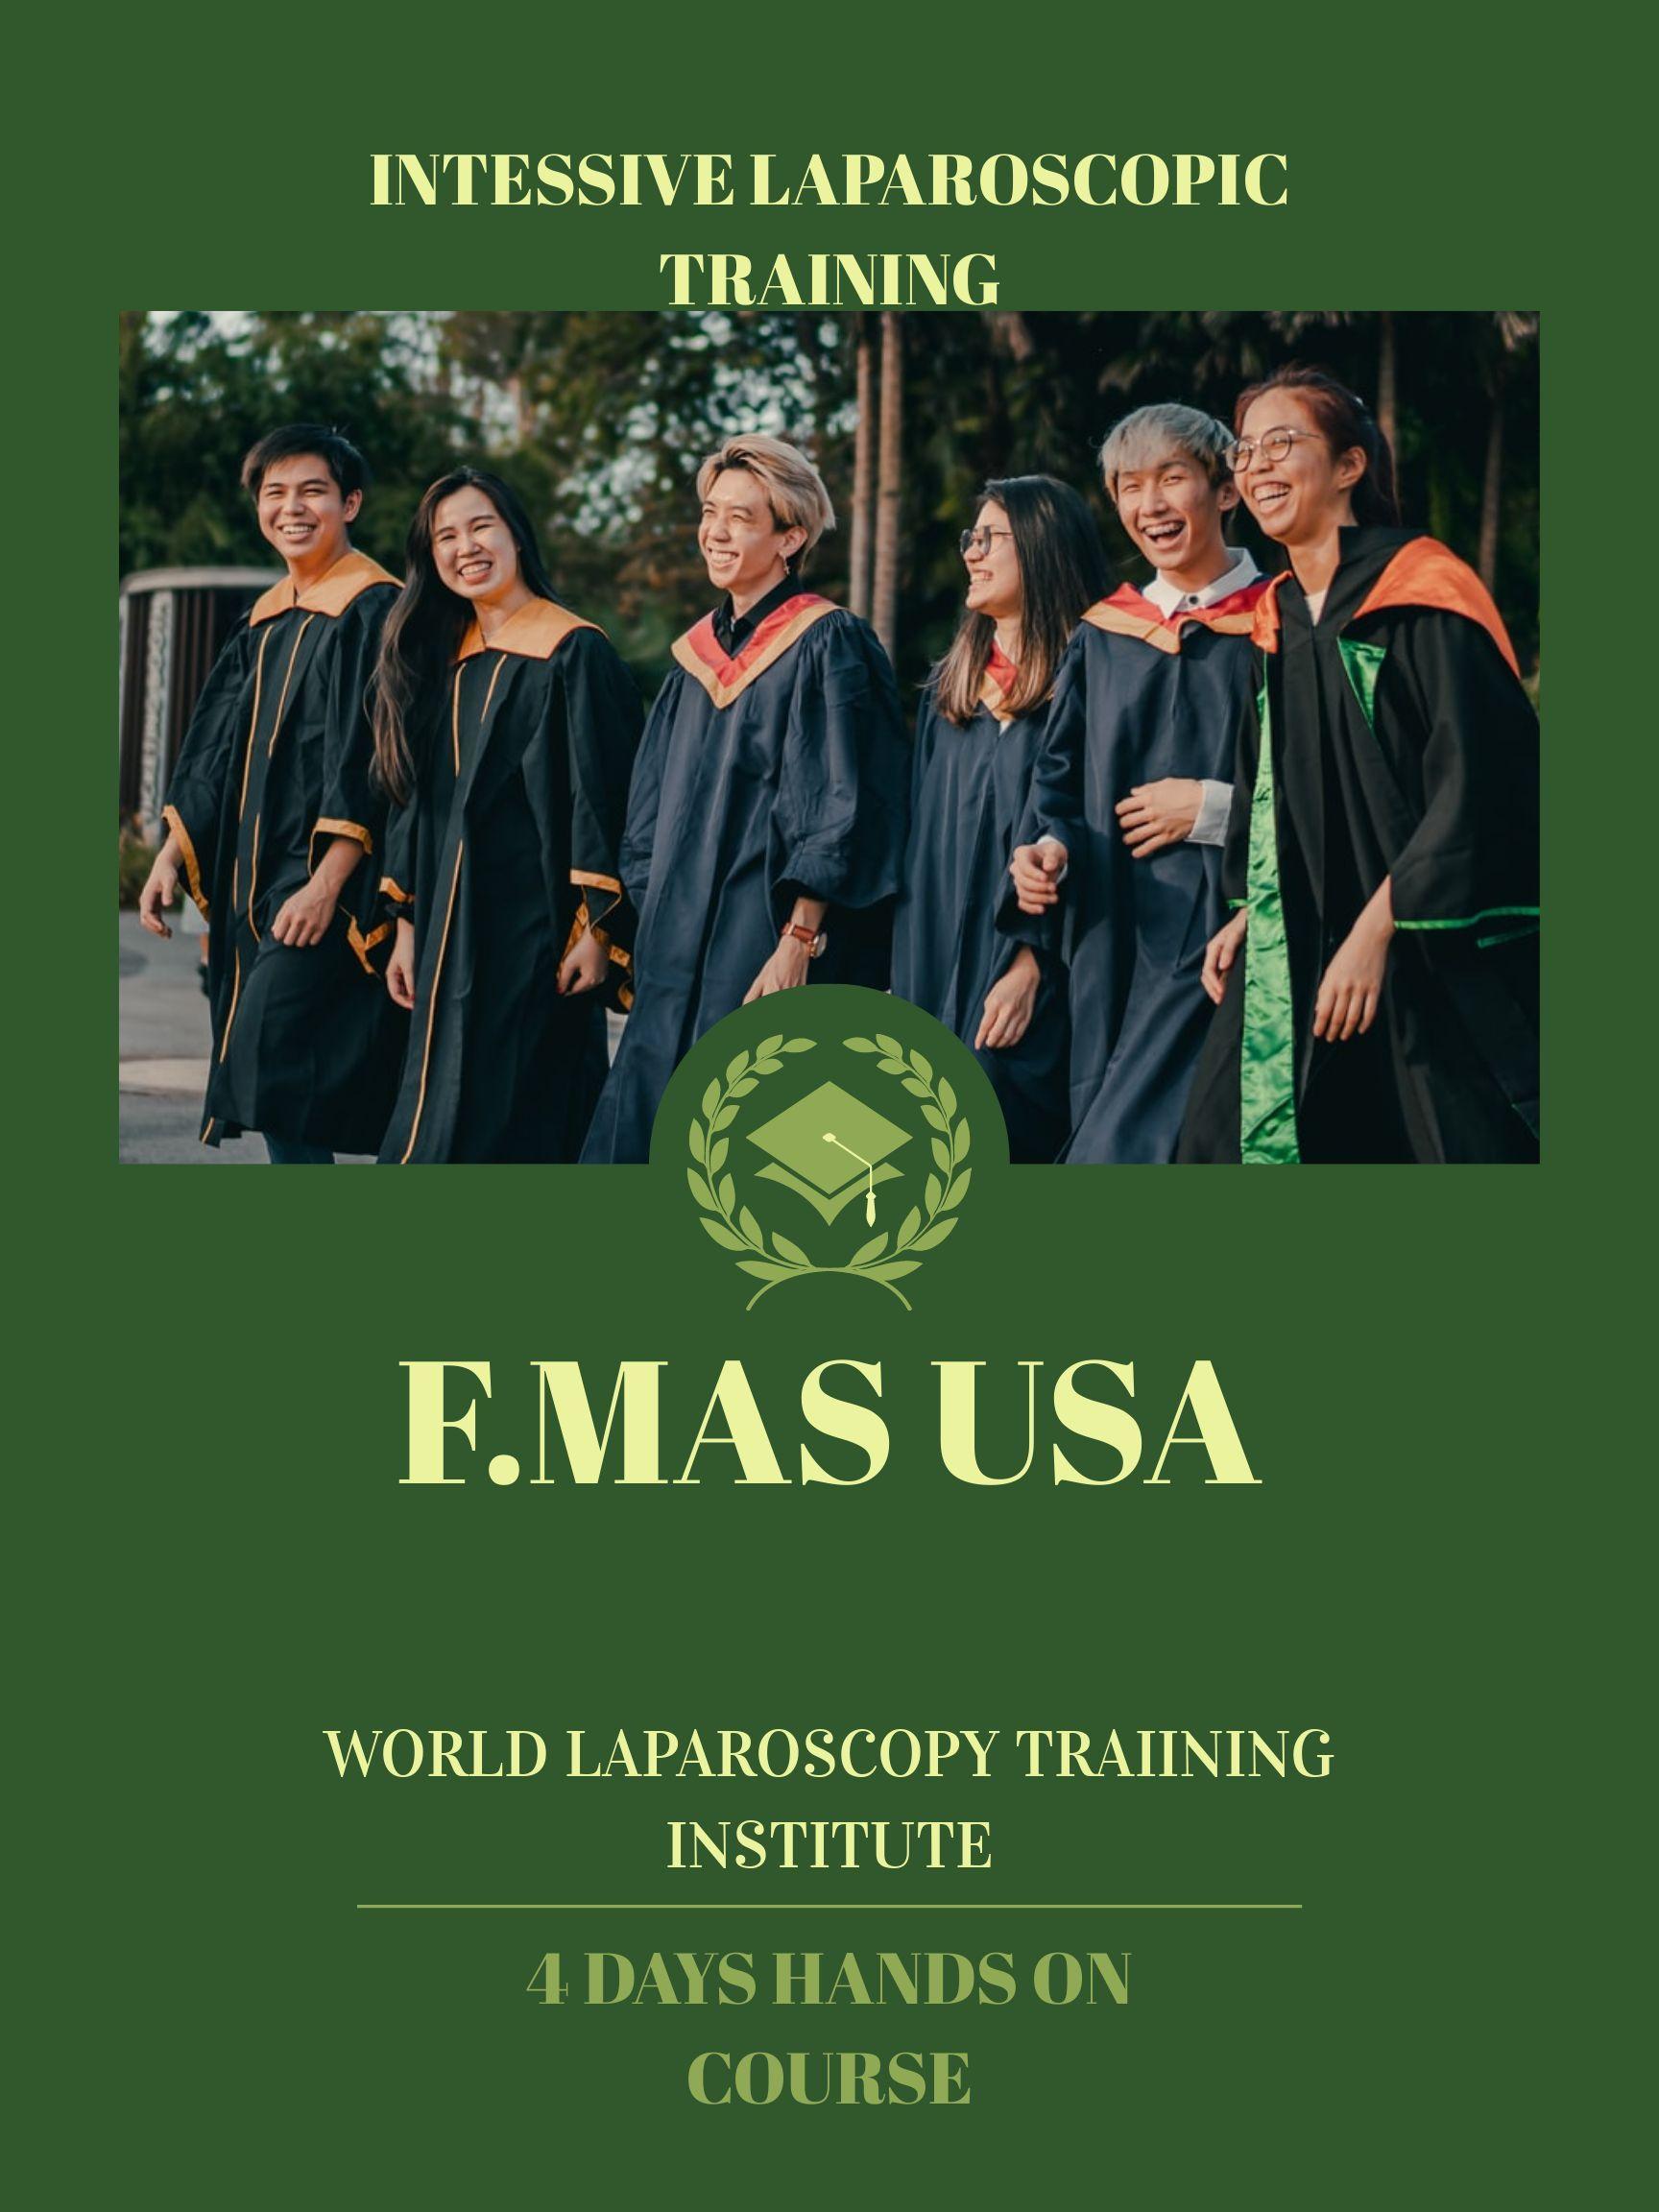 Laparoscopic Surgery Training in United States of America